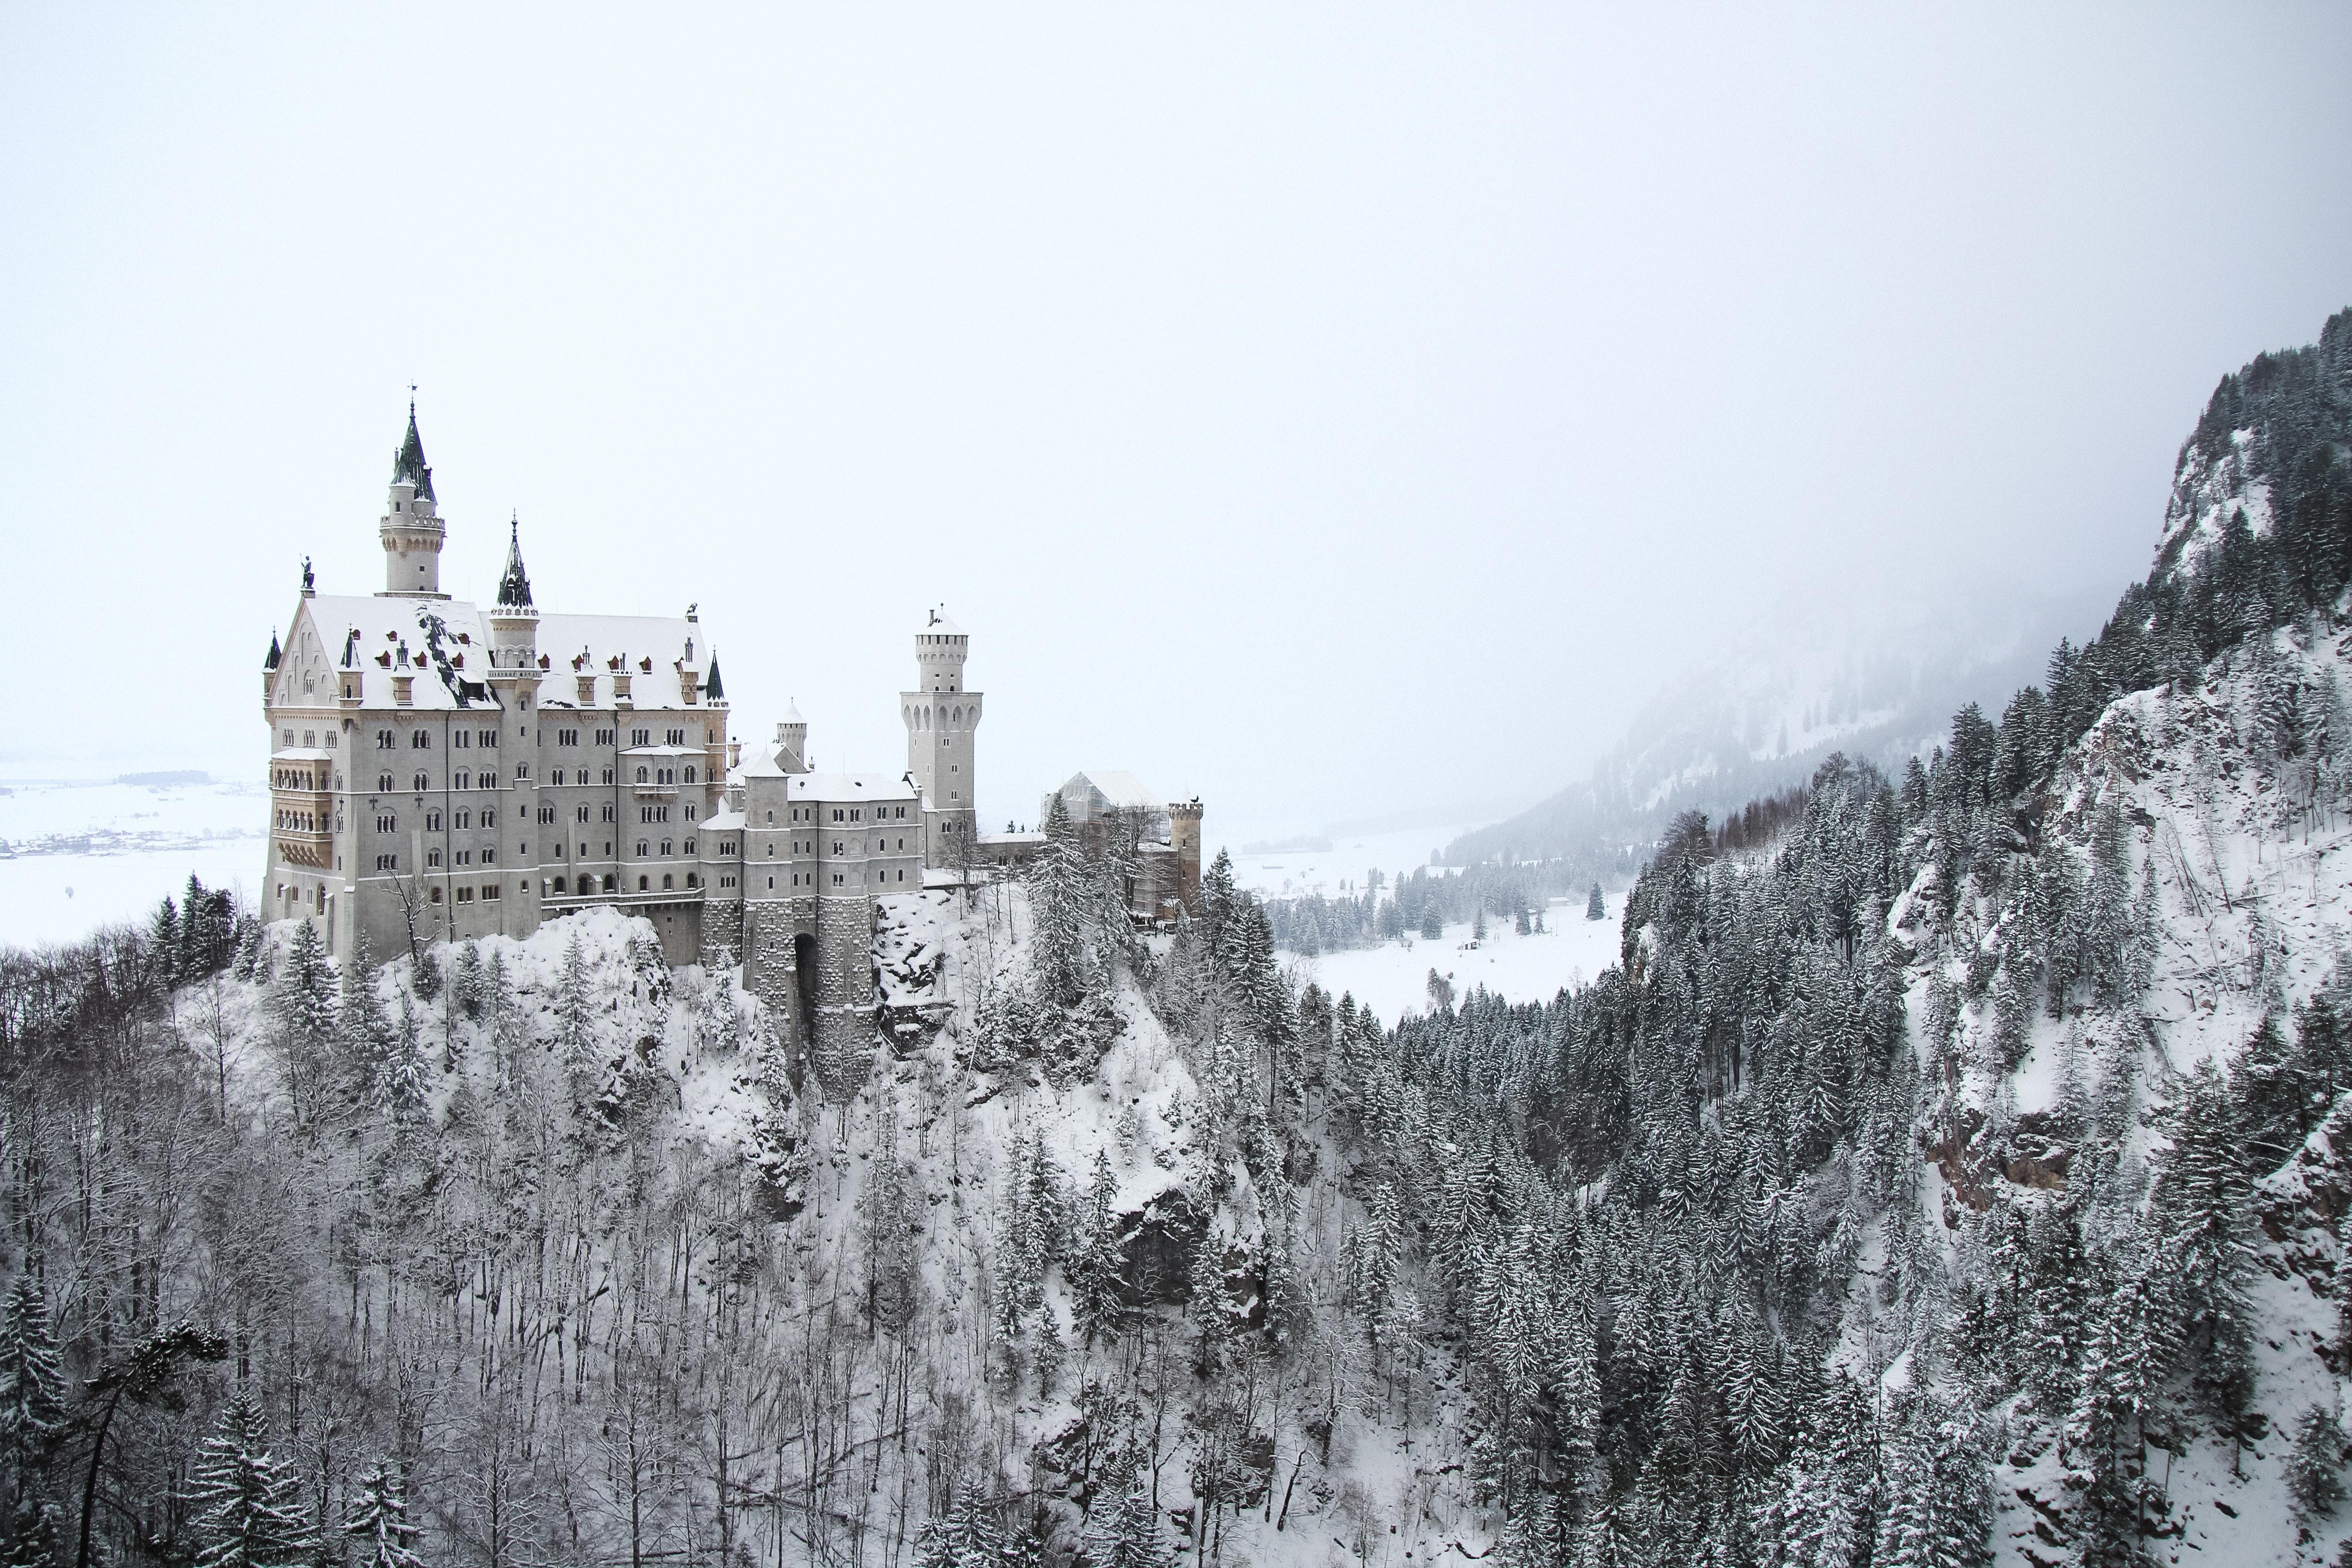 Neuschwanstein castle on a snowy hill